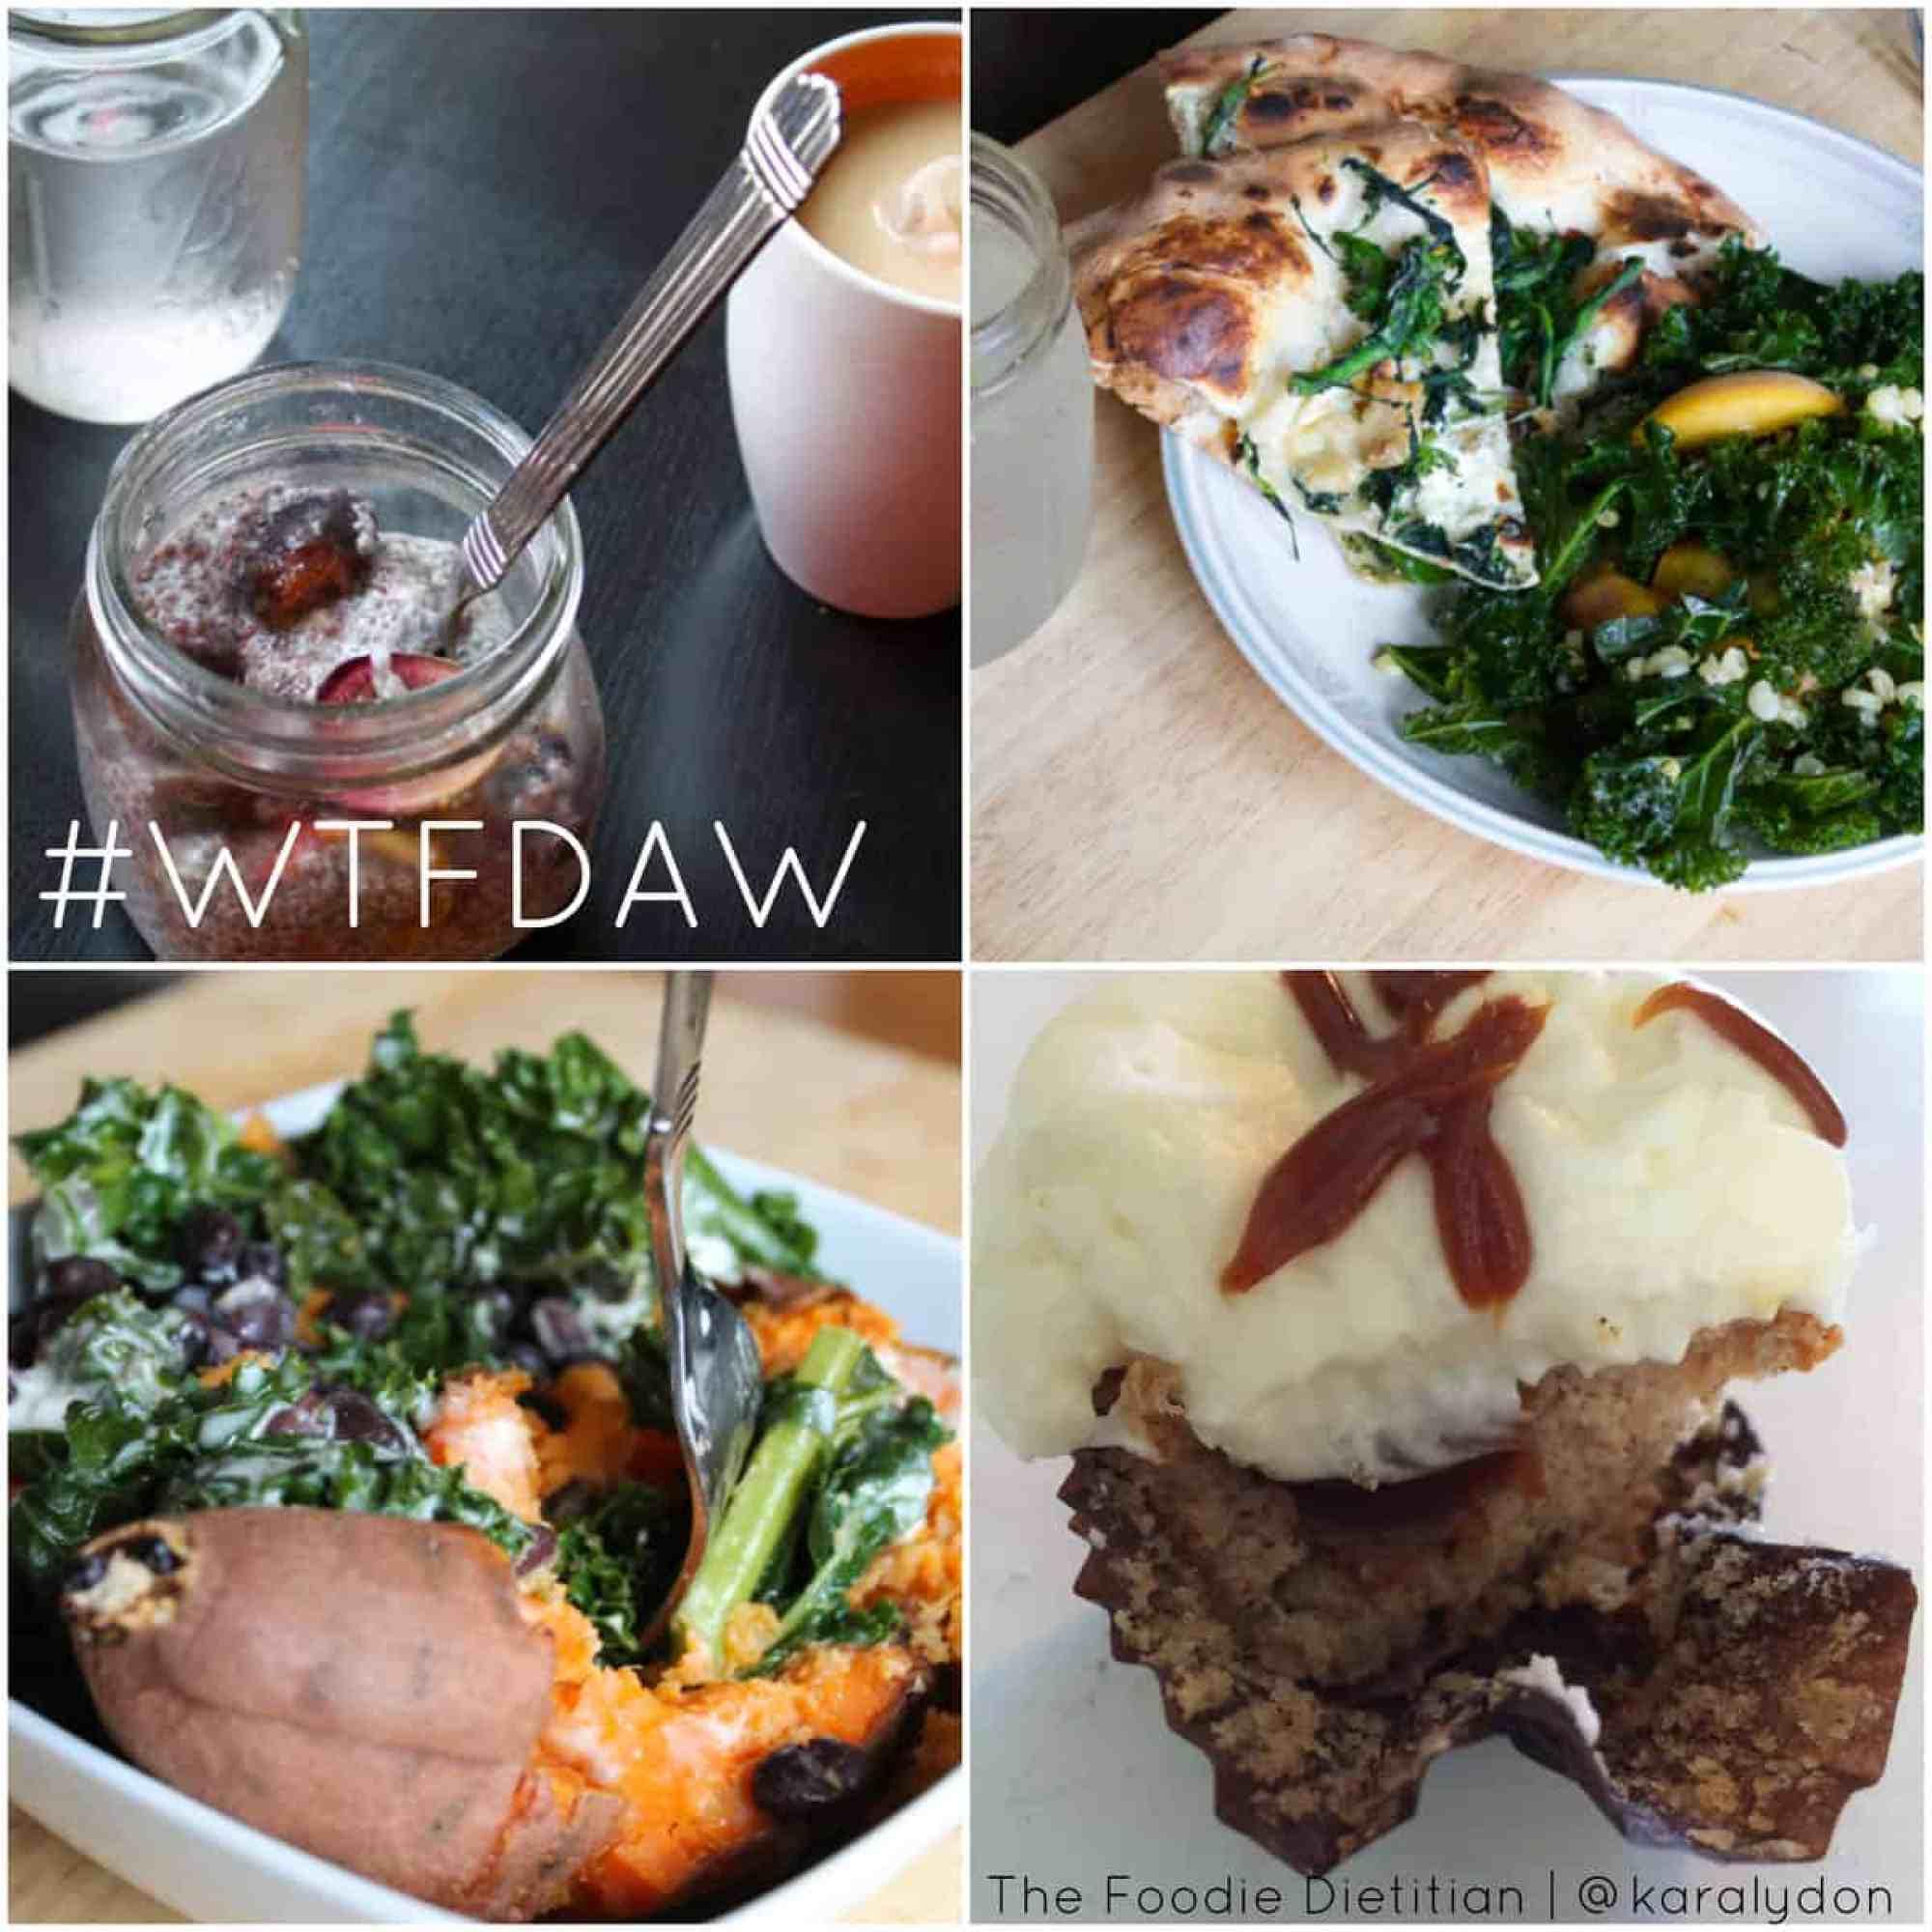 What The Foodie Dietitian Ate Wednesday #WTFDAW   The Foodie Dietitian @karalydon